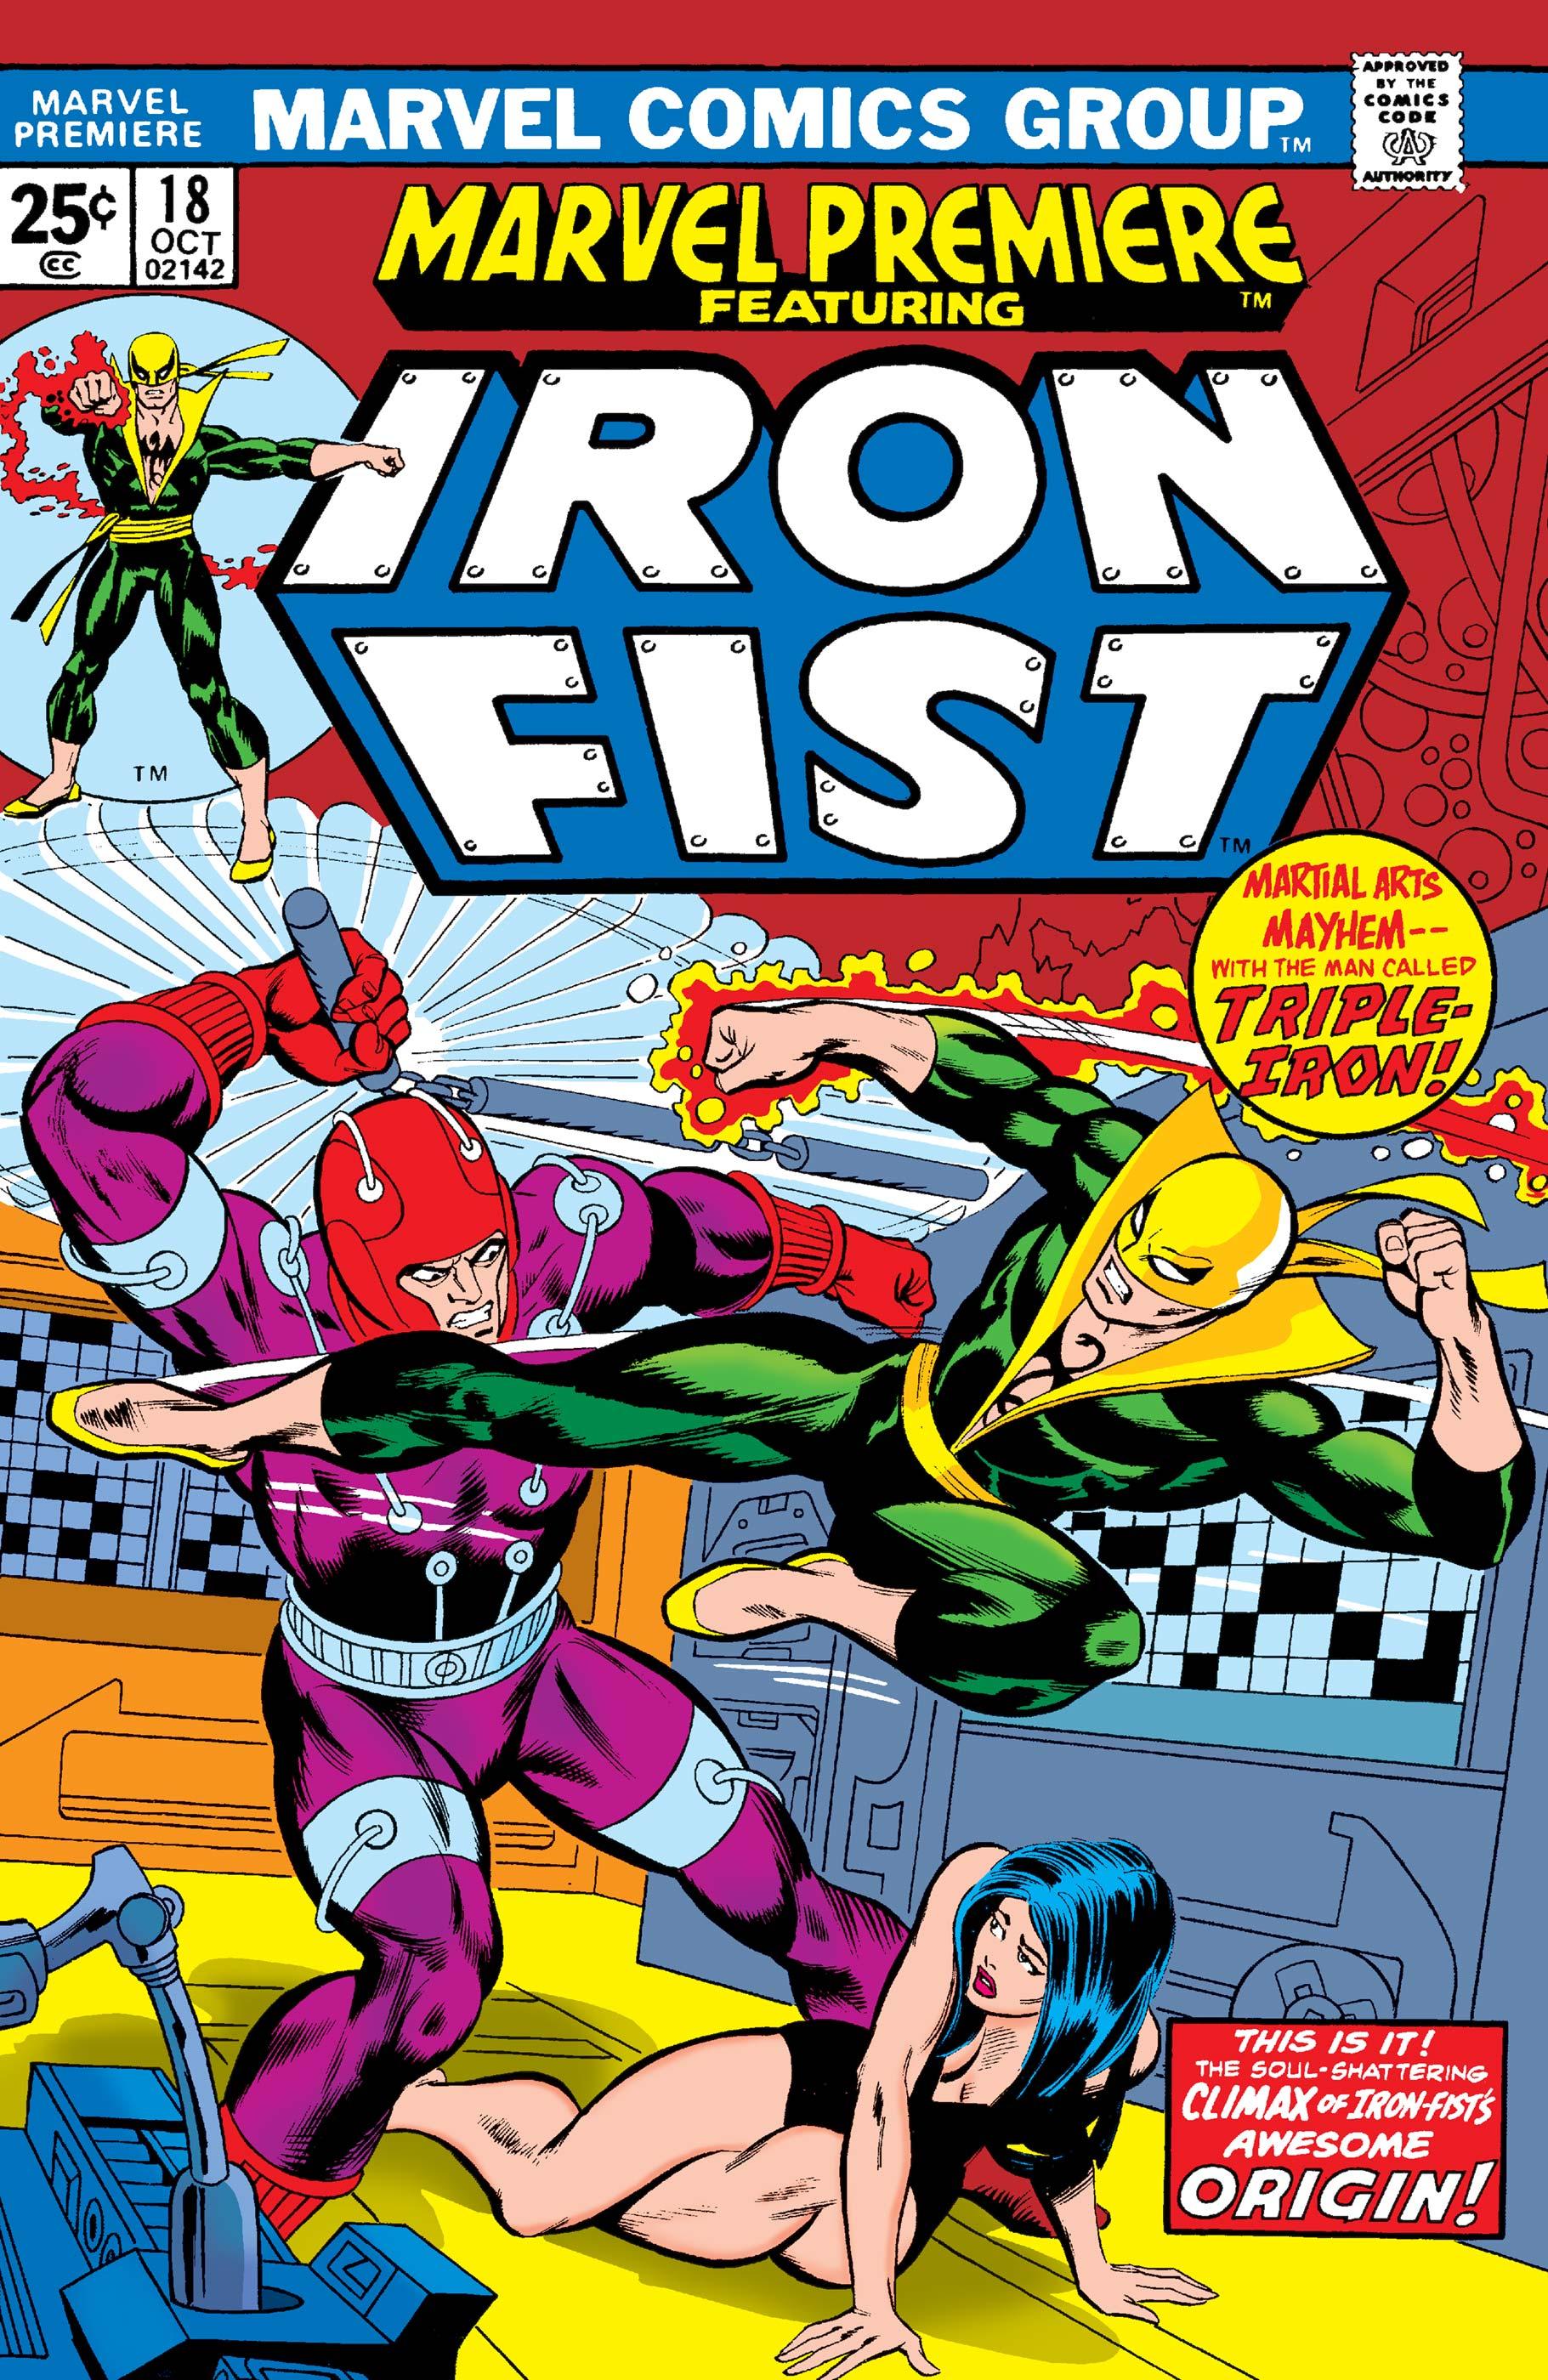 Marvel Premiere (1972) #18